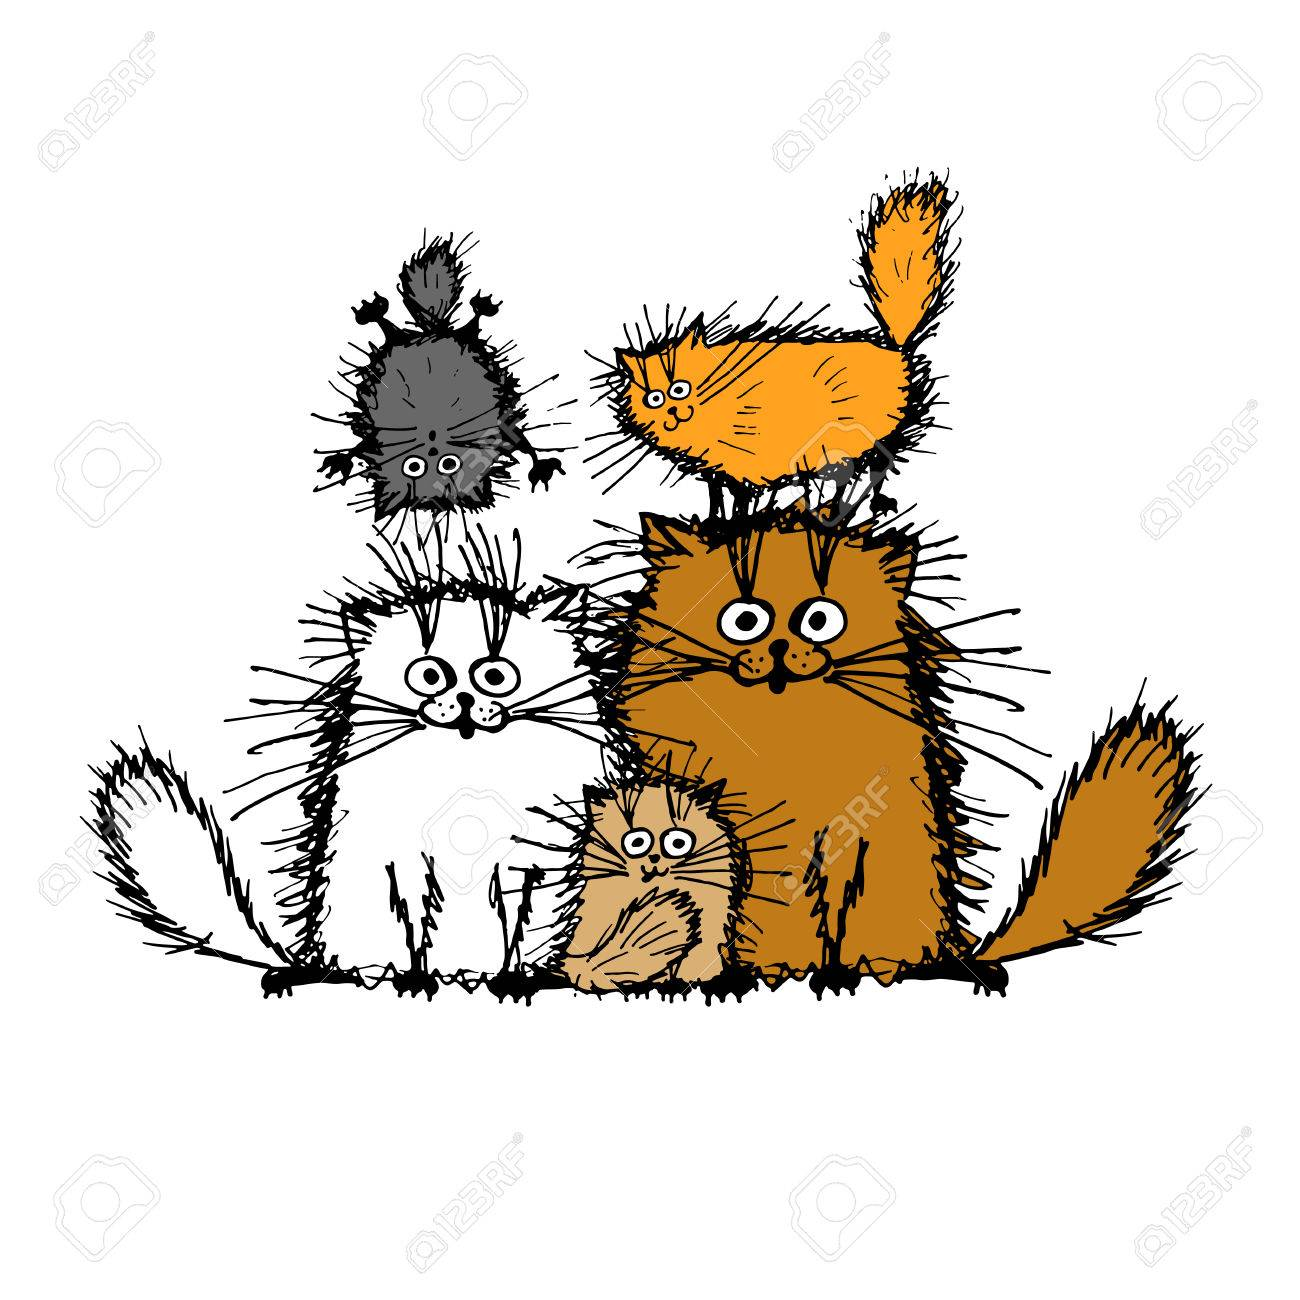 Fluffy cats family, sketch for your design. Vector illustration Foto de archivo - 51825225